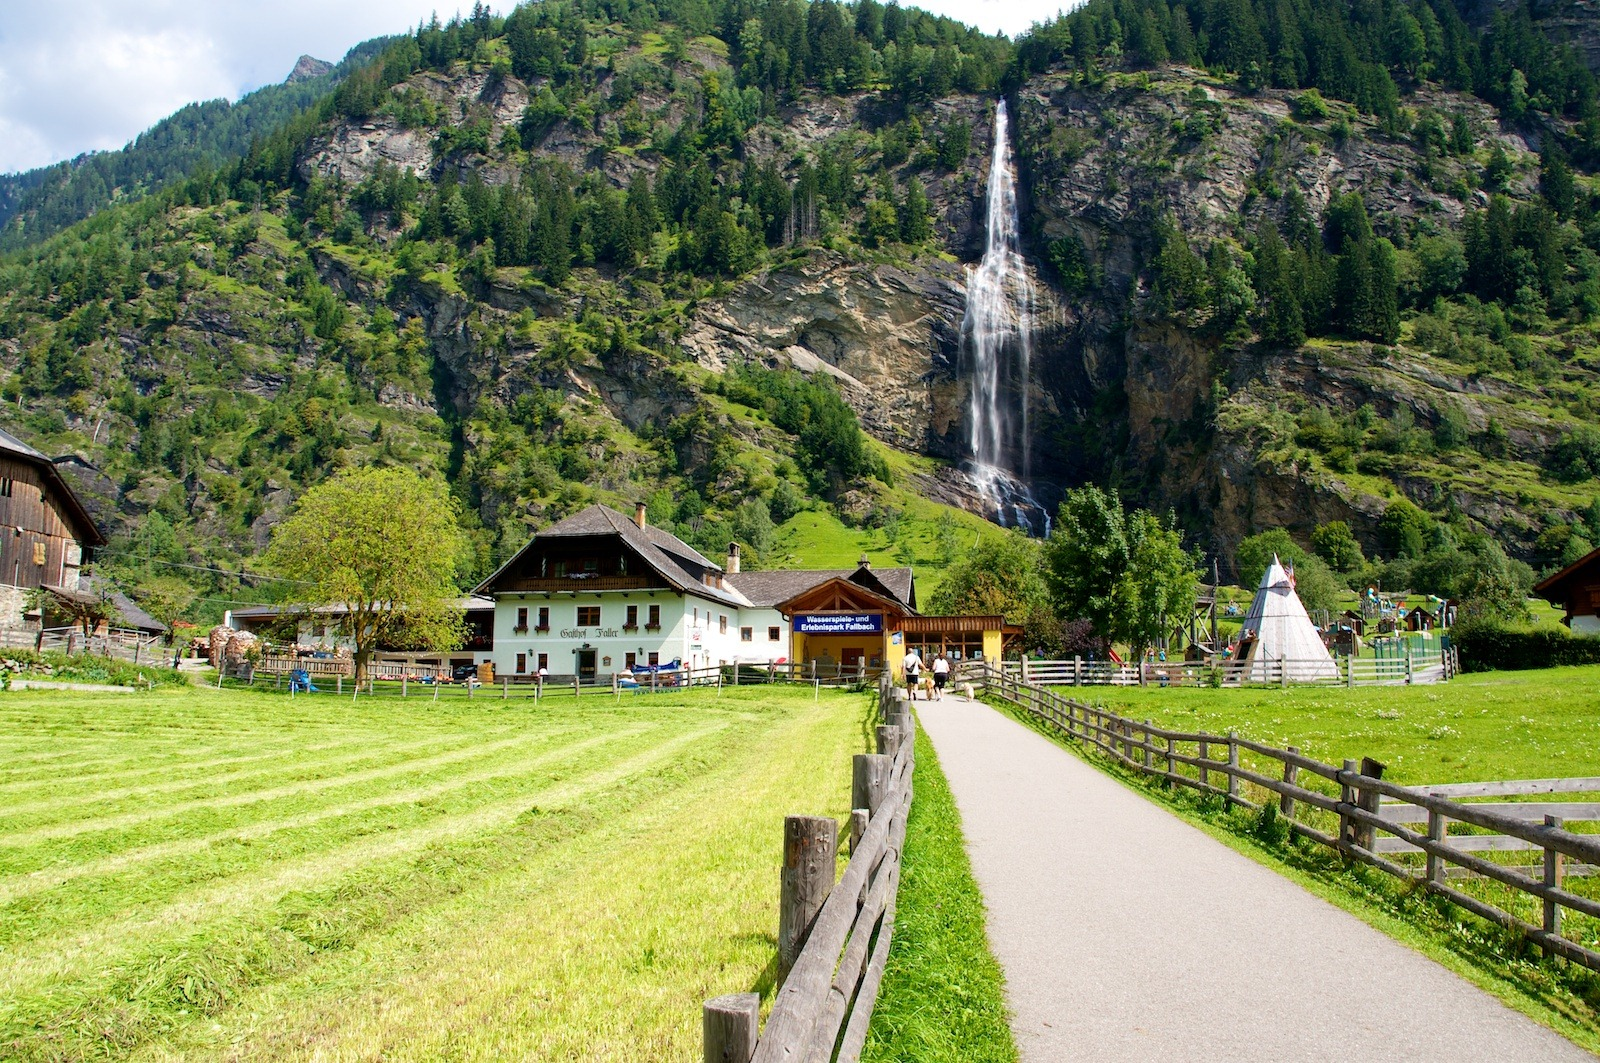 Fallbach Klettersteig - 005